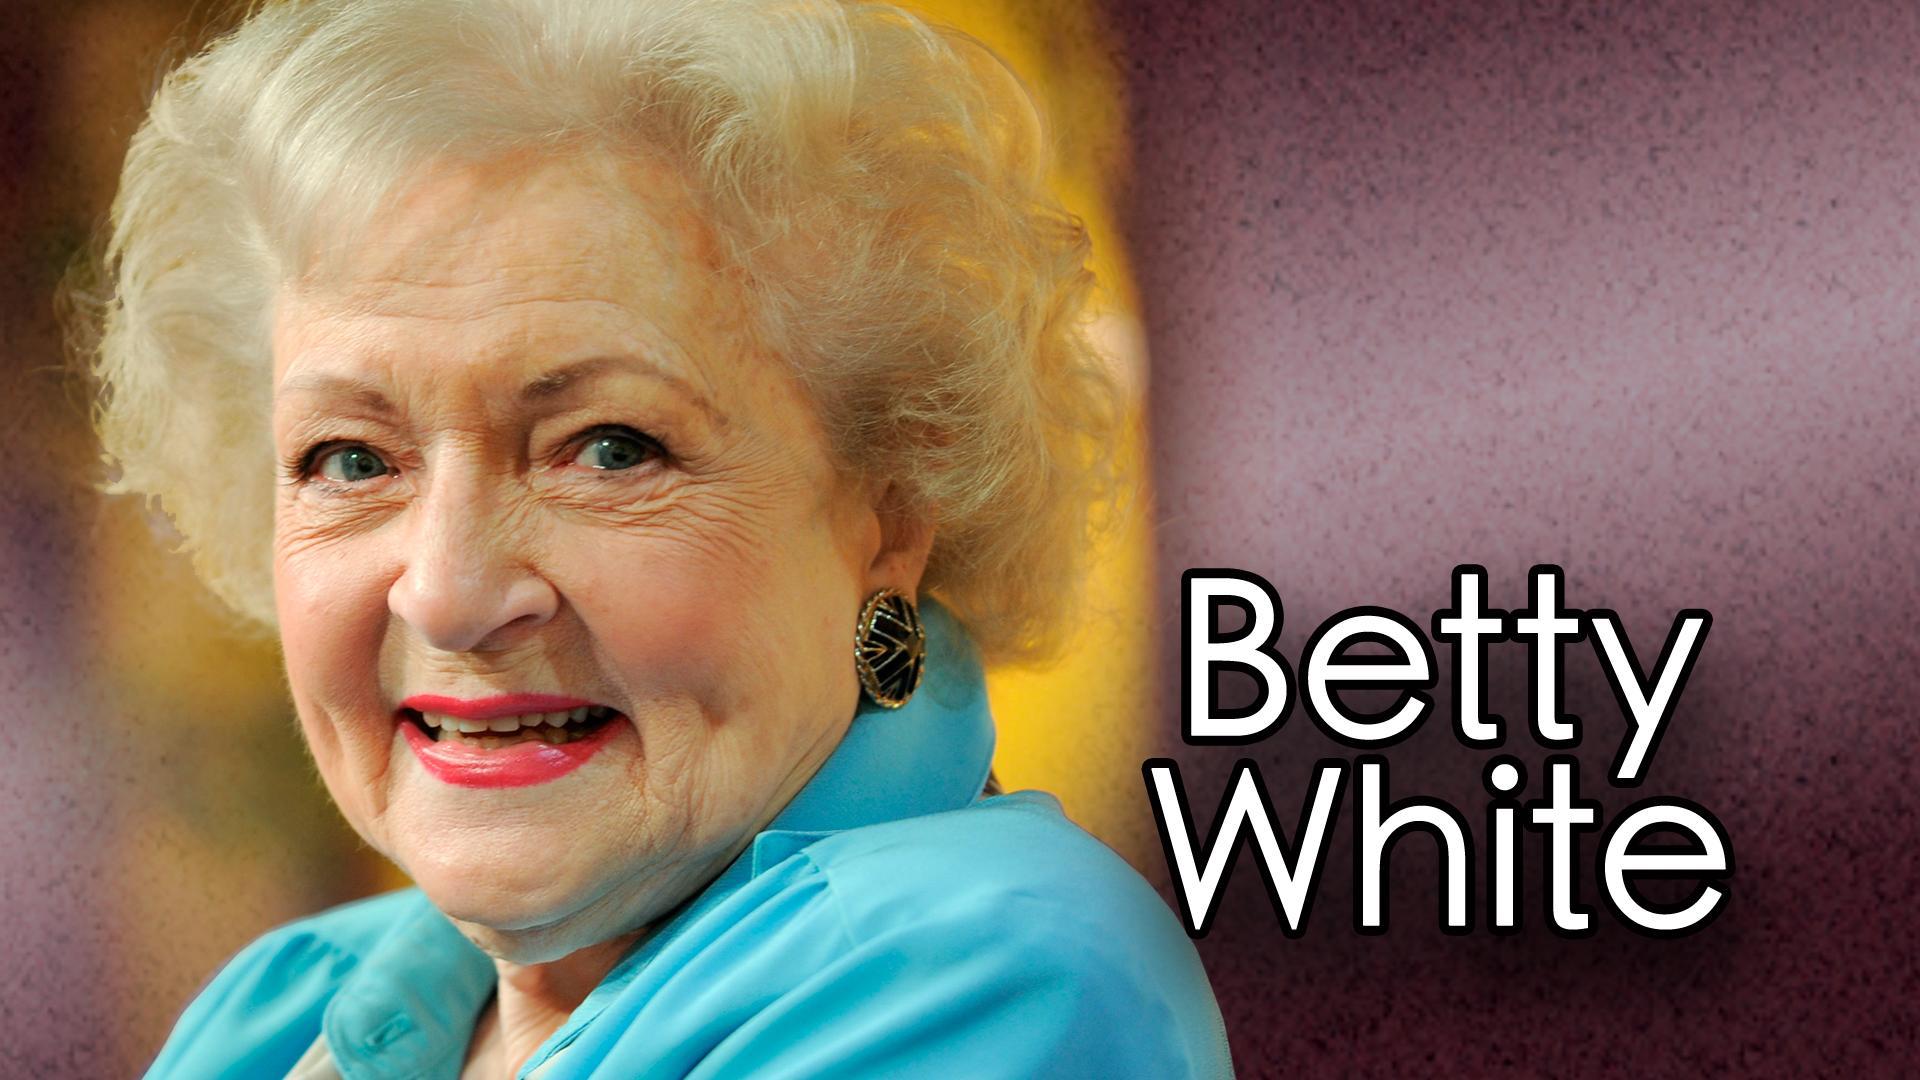 Betty White celebrates her 97th birthday today